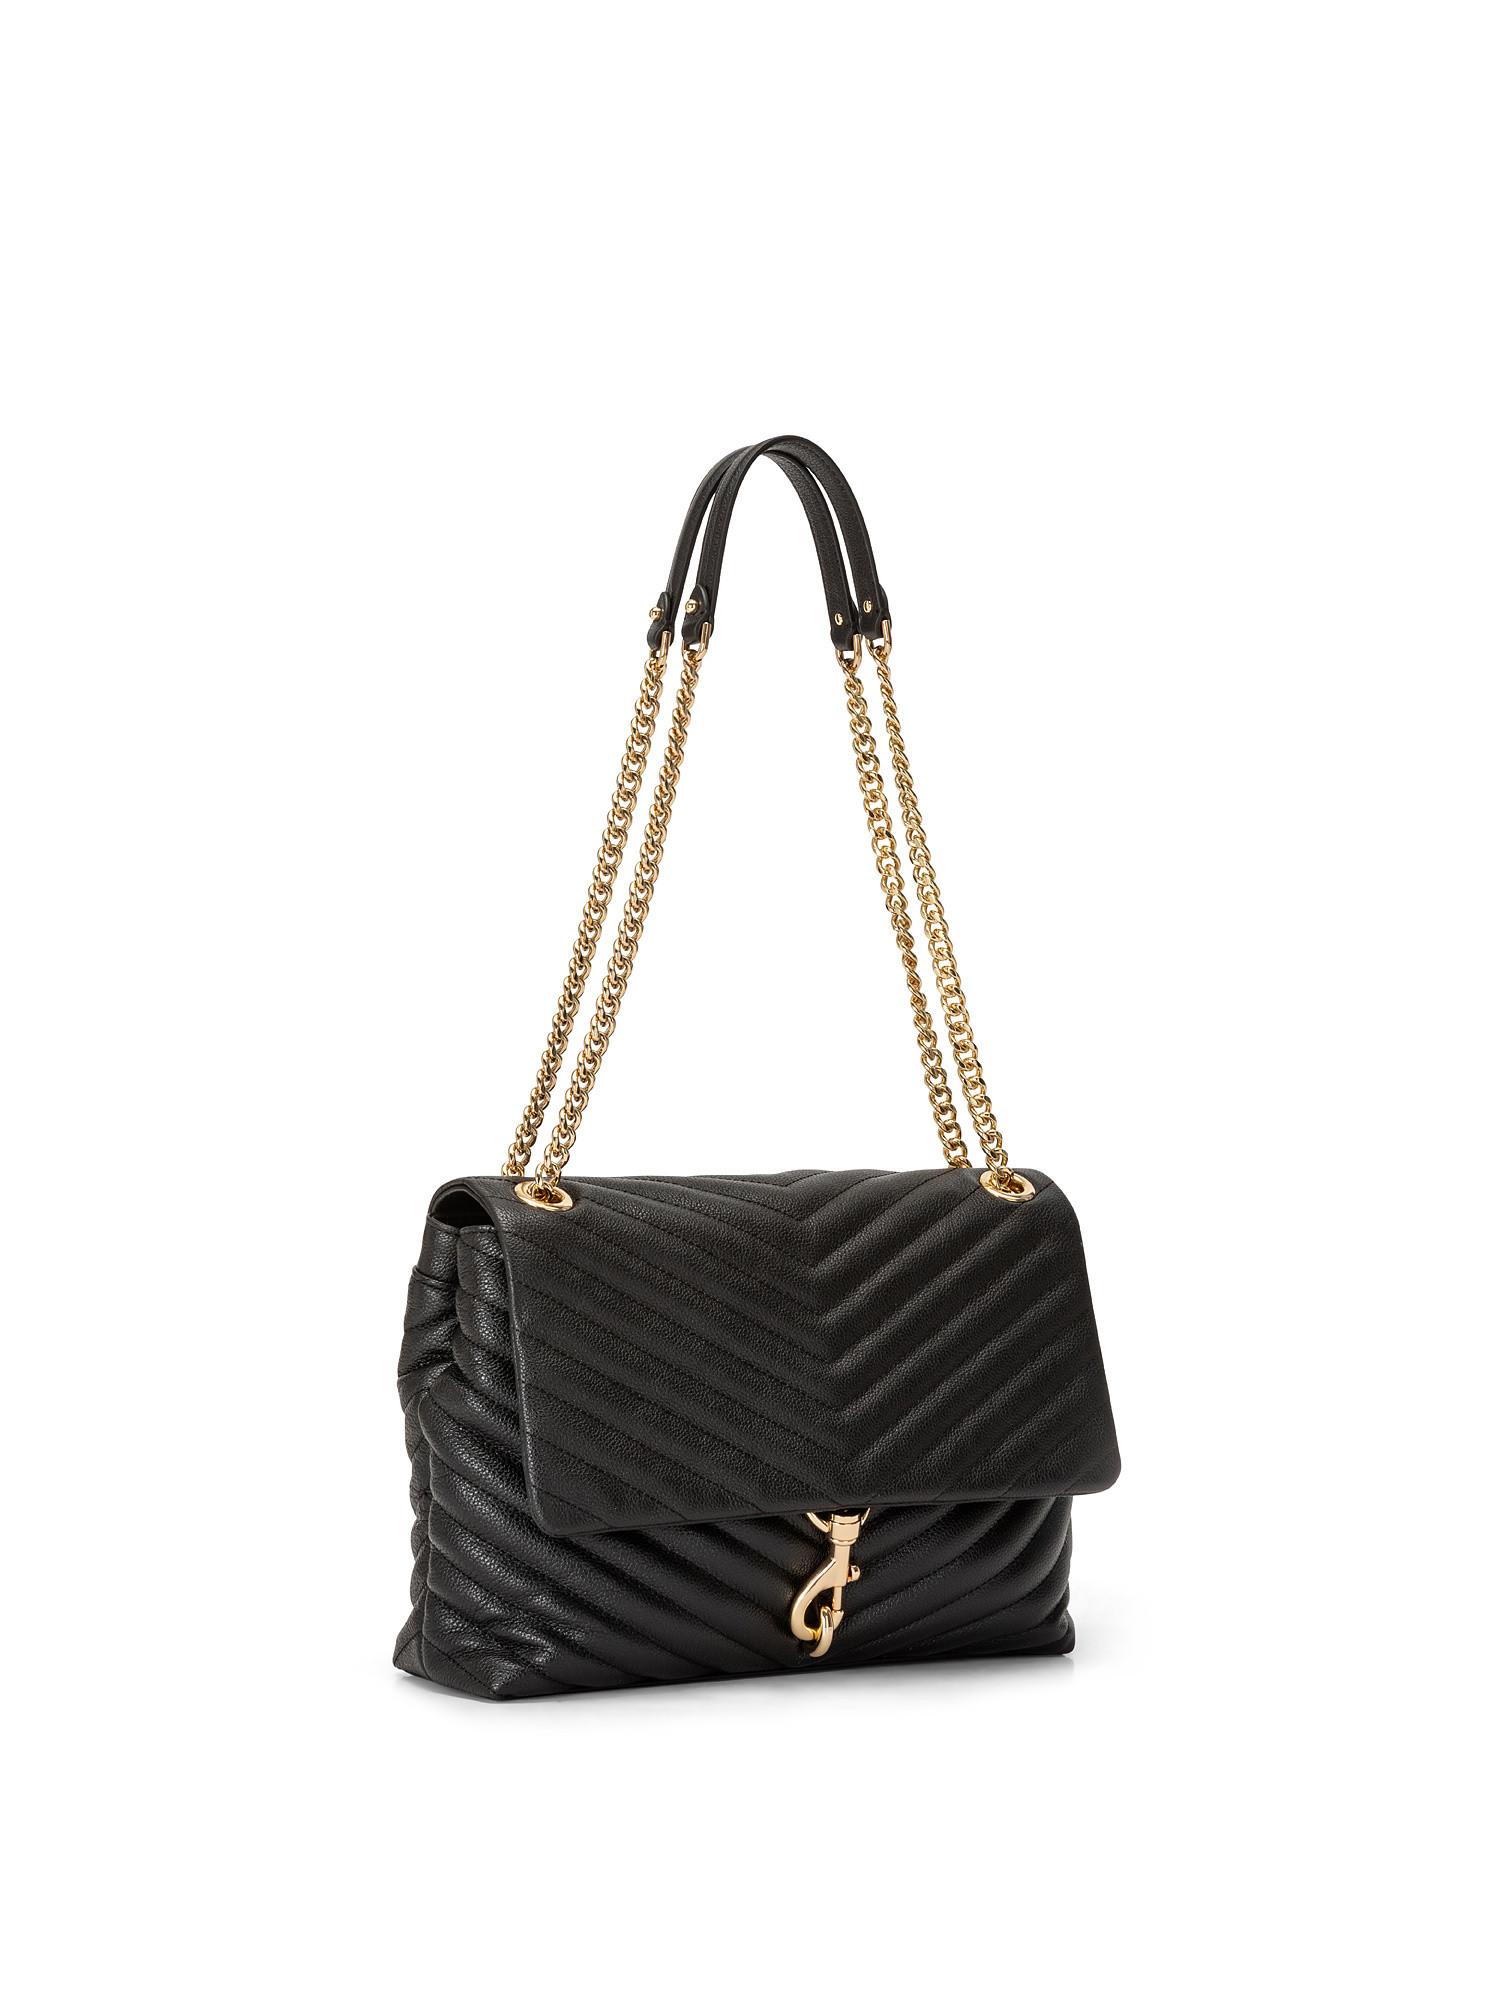 Edie Flap Shoulder Bag, Nero, large image number 1